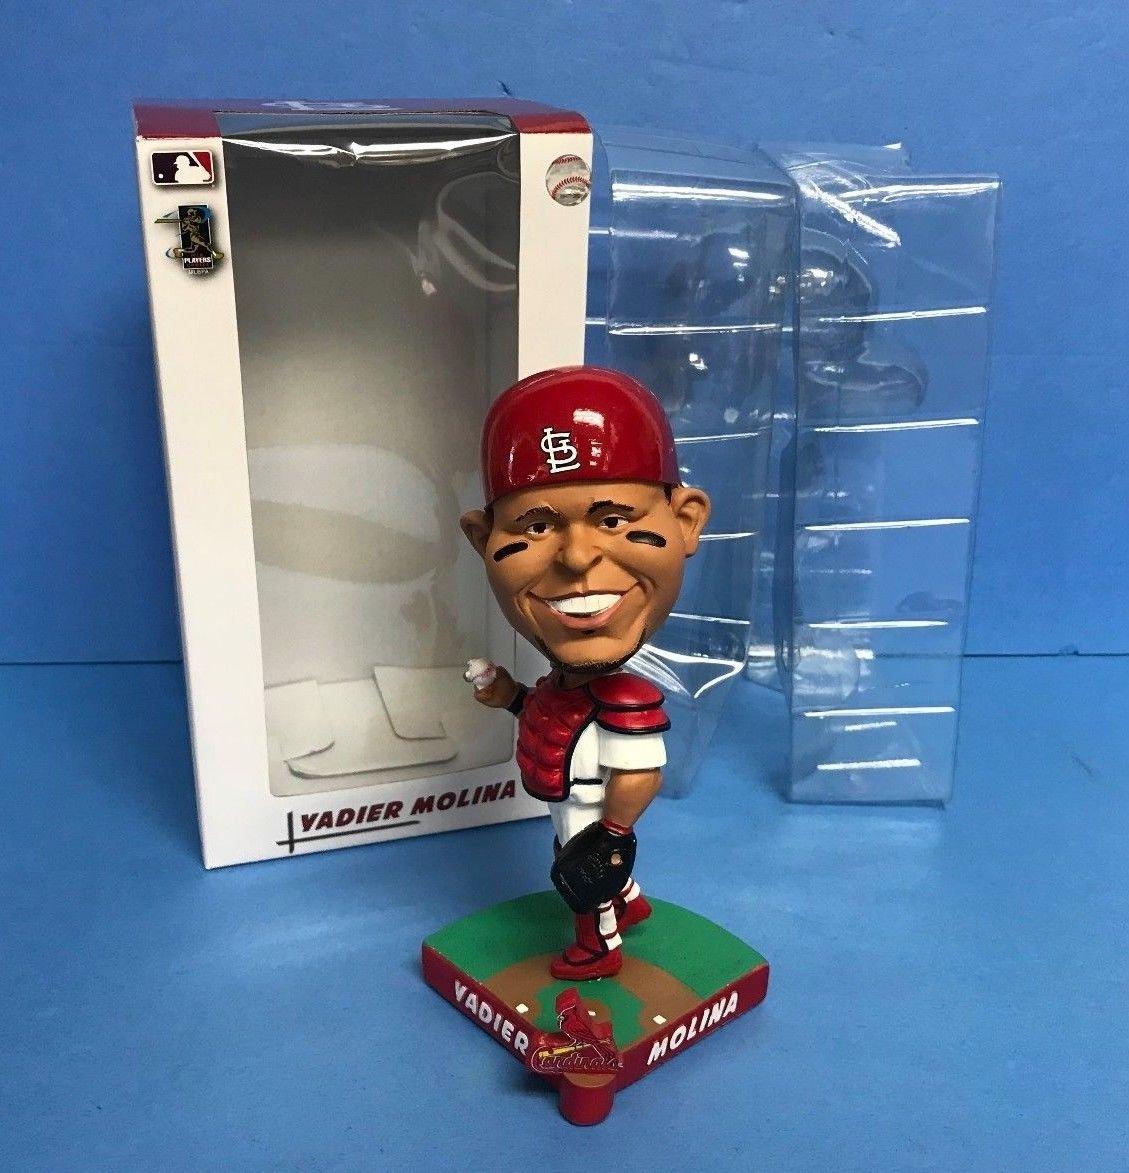 Yadier Molina CARICATURE St Louis Cardinals Limited Edition MLB Bobblehead